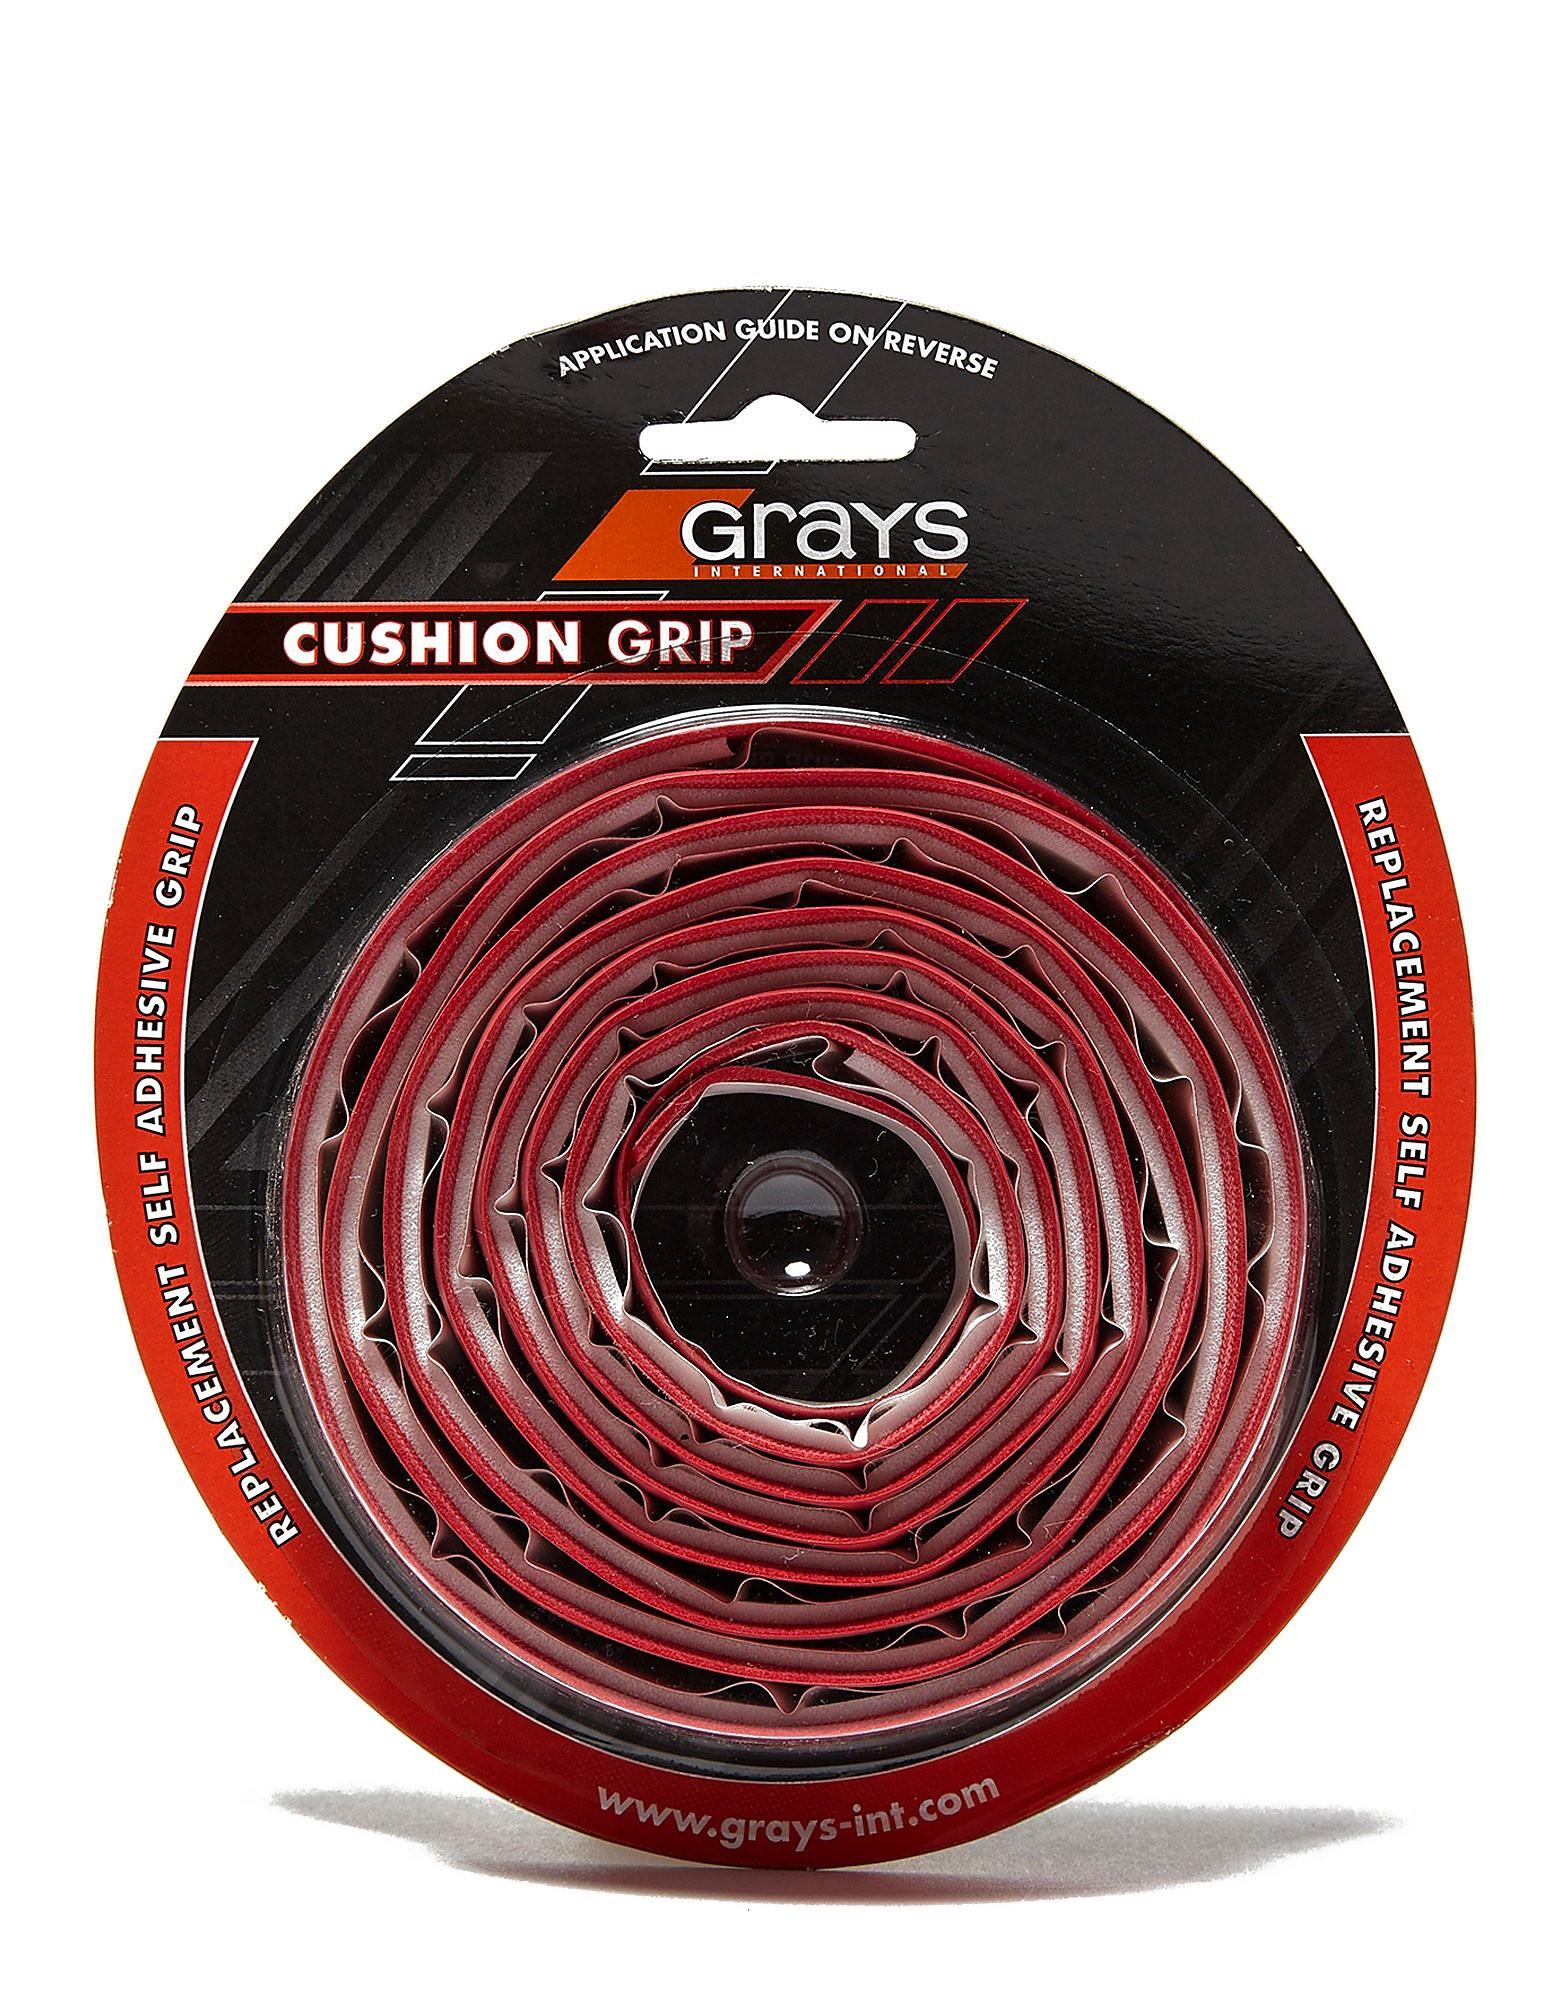 Grays Cushion Grip